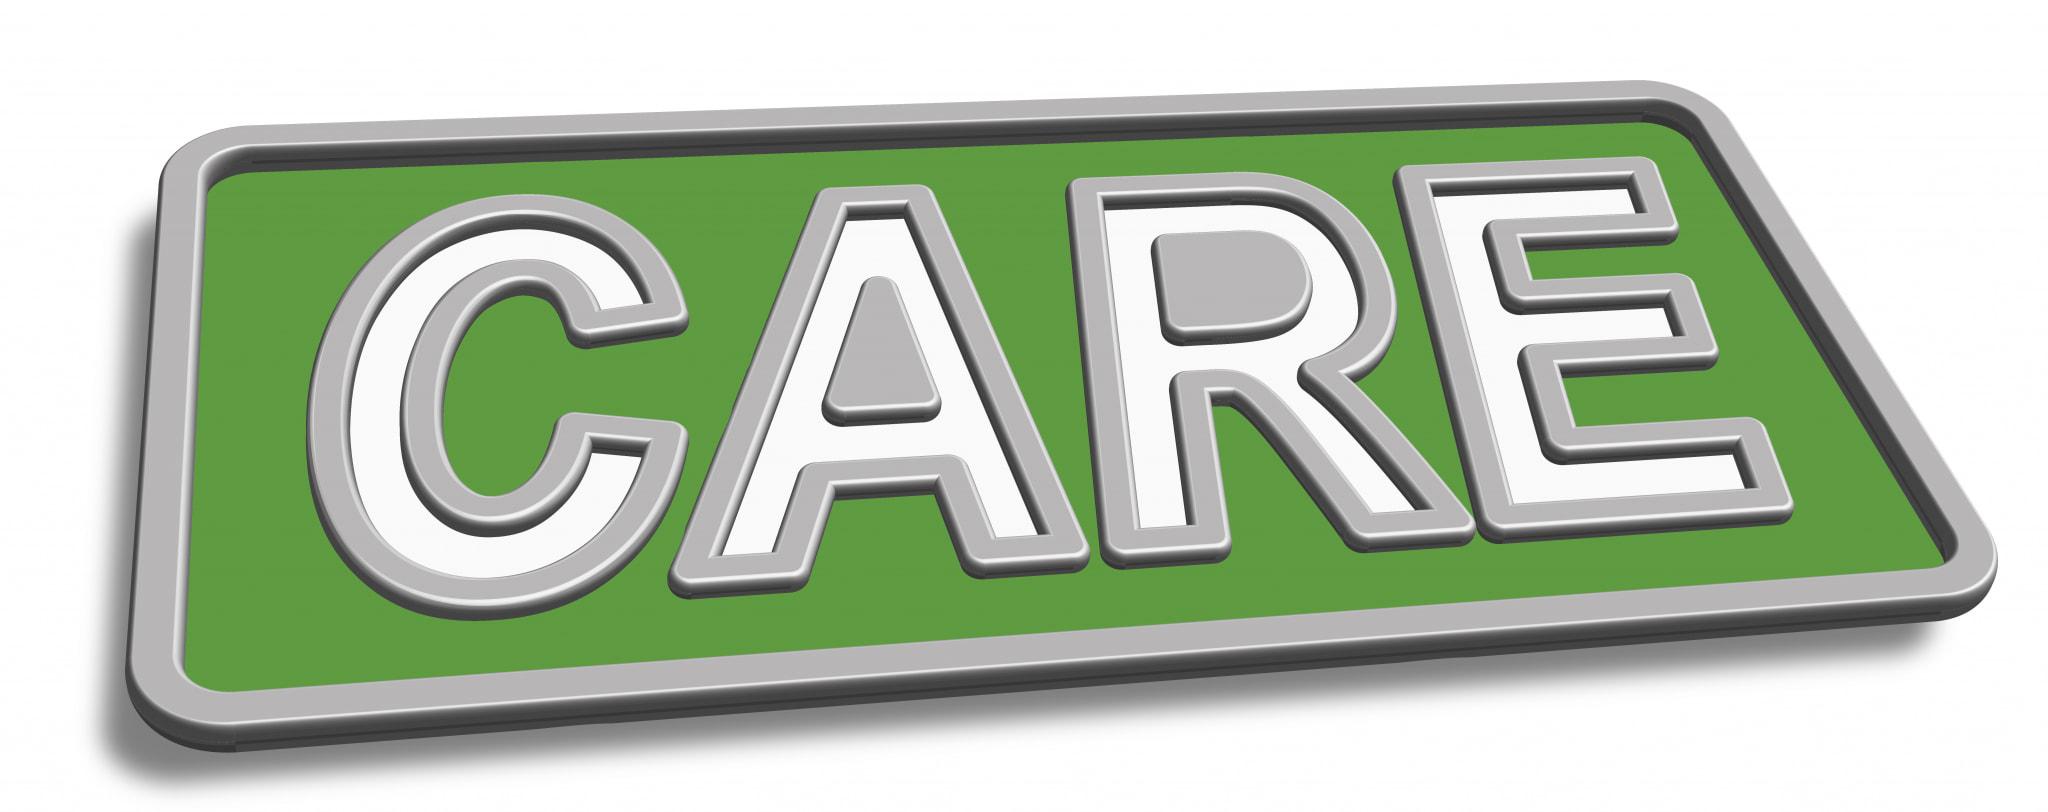 Care-badge Logo.jpg